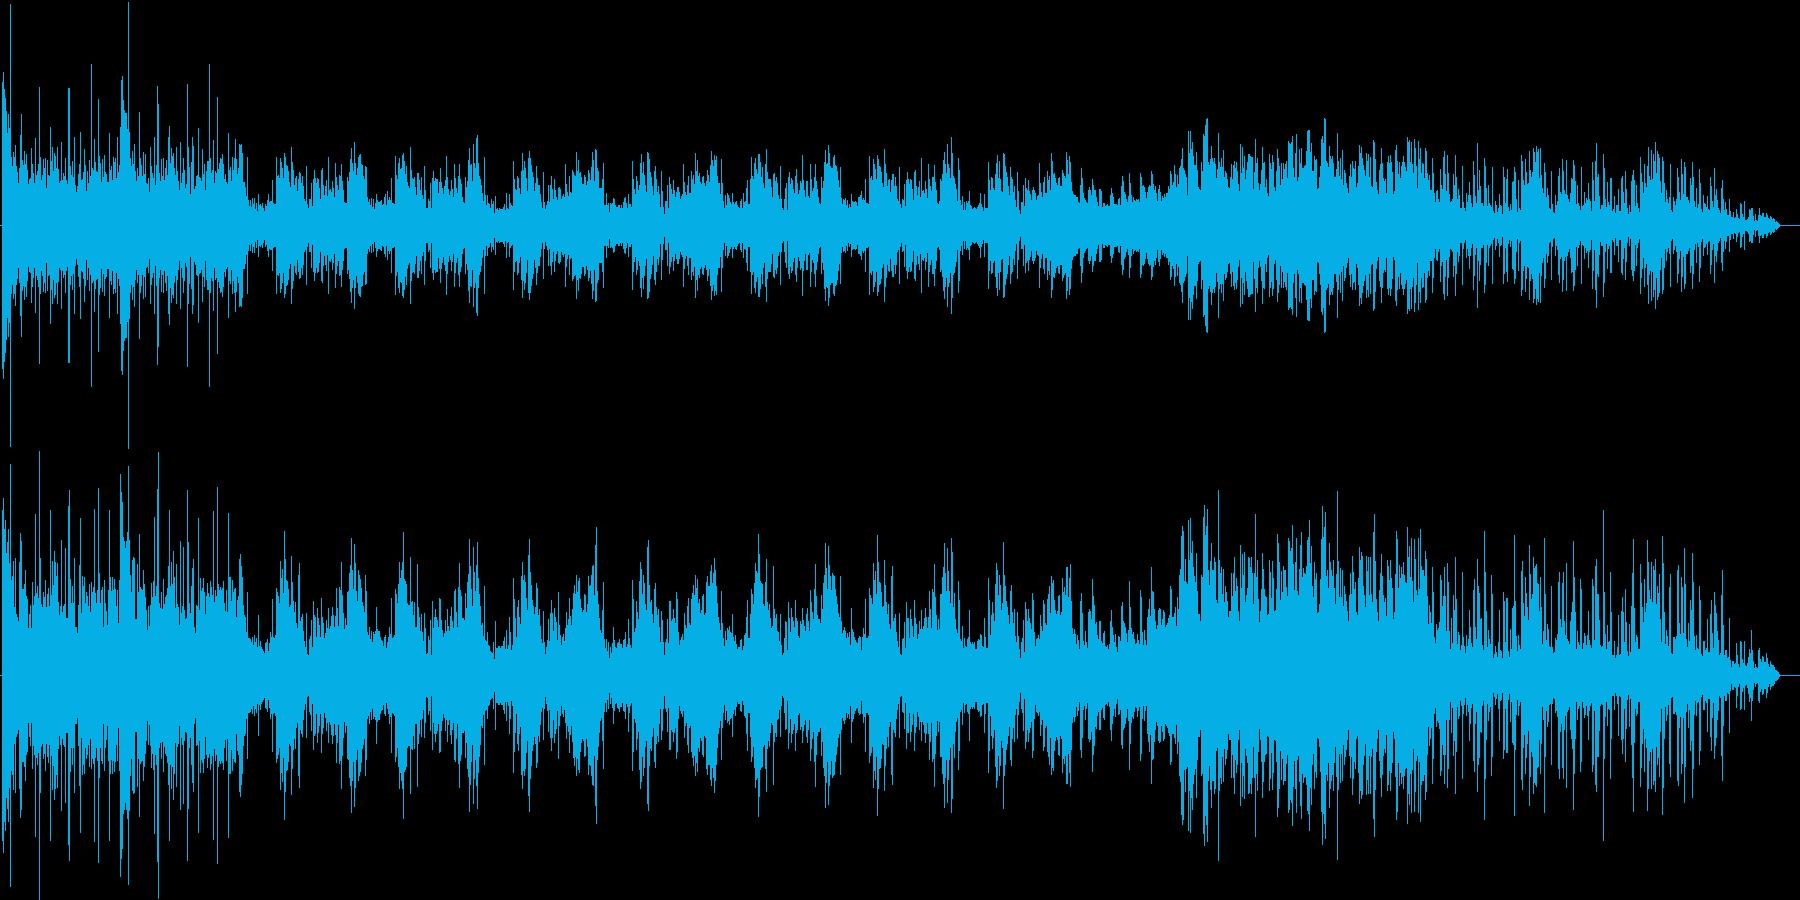 148bpm、Ab-Maj、ピアノメインの再生済みの波形